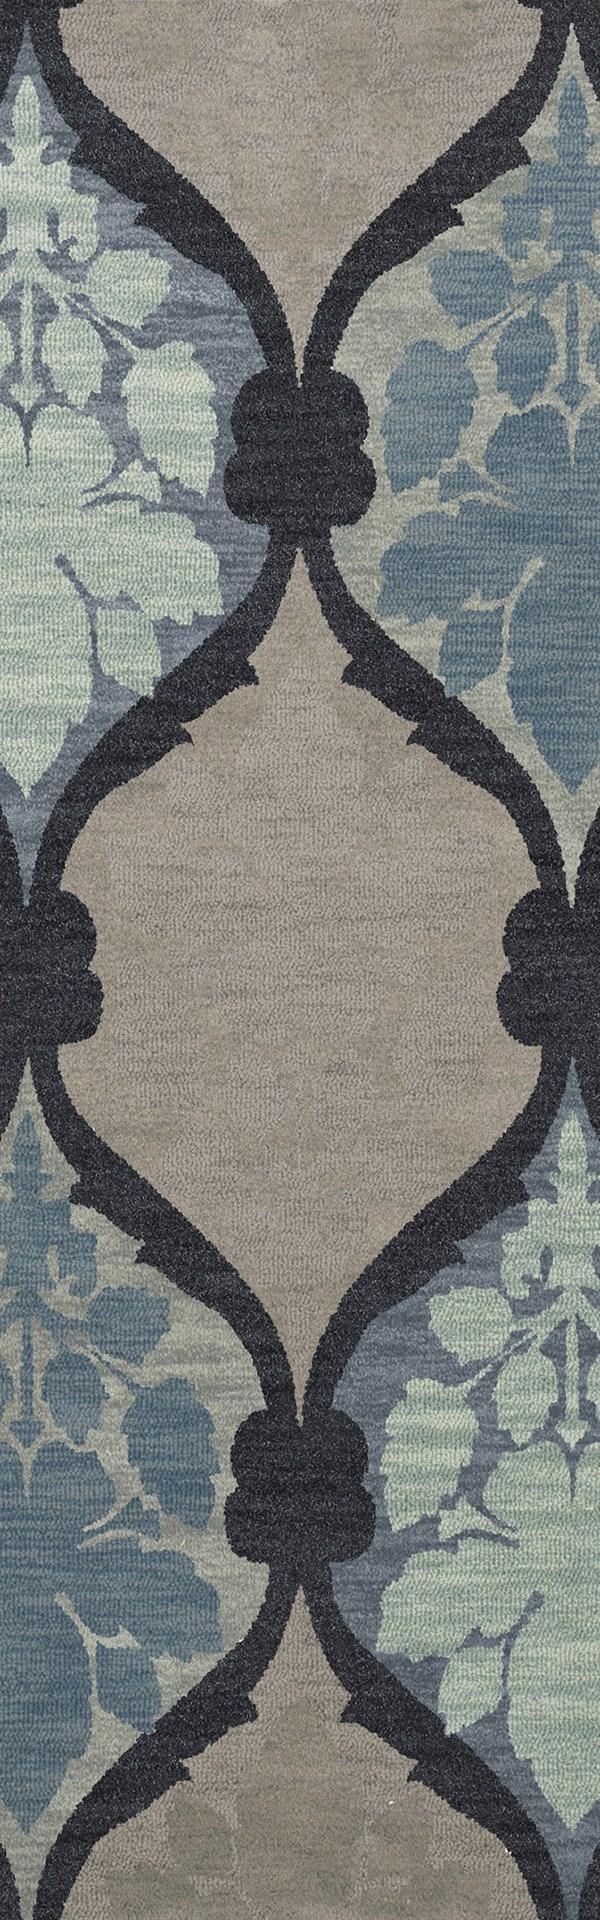 Navy, Grey, Blue Transitional Area Rug